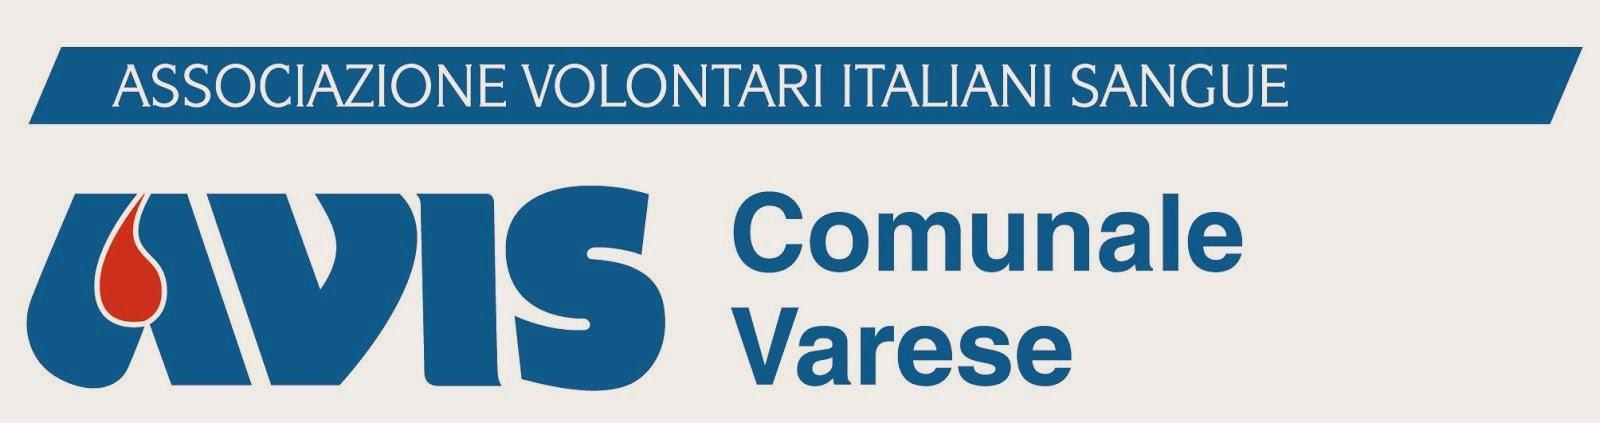 Avis Comunale Varese